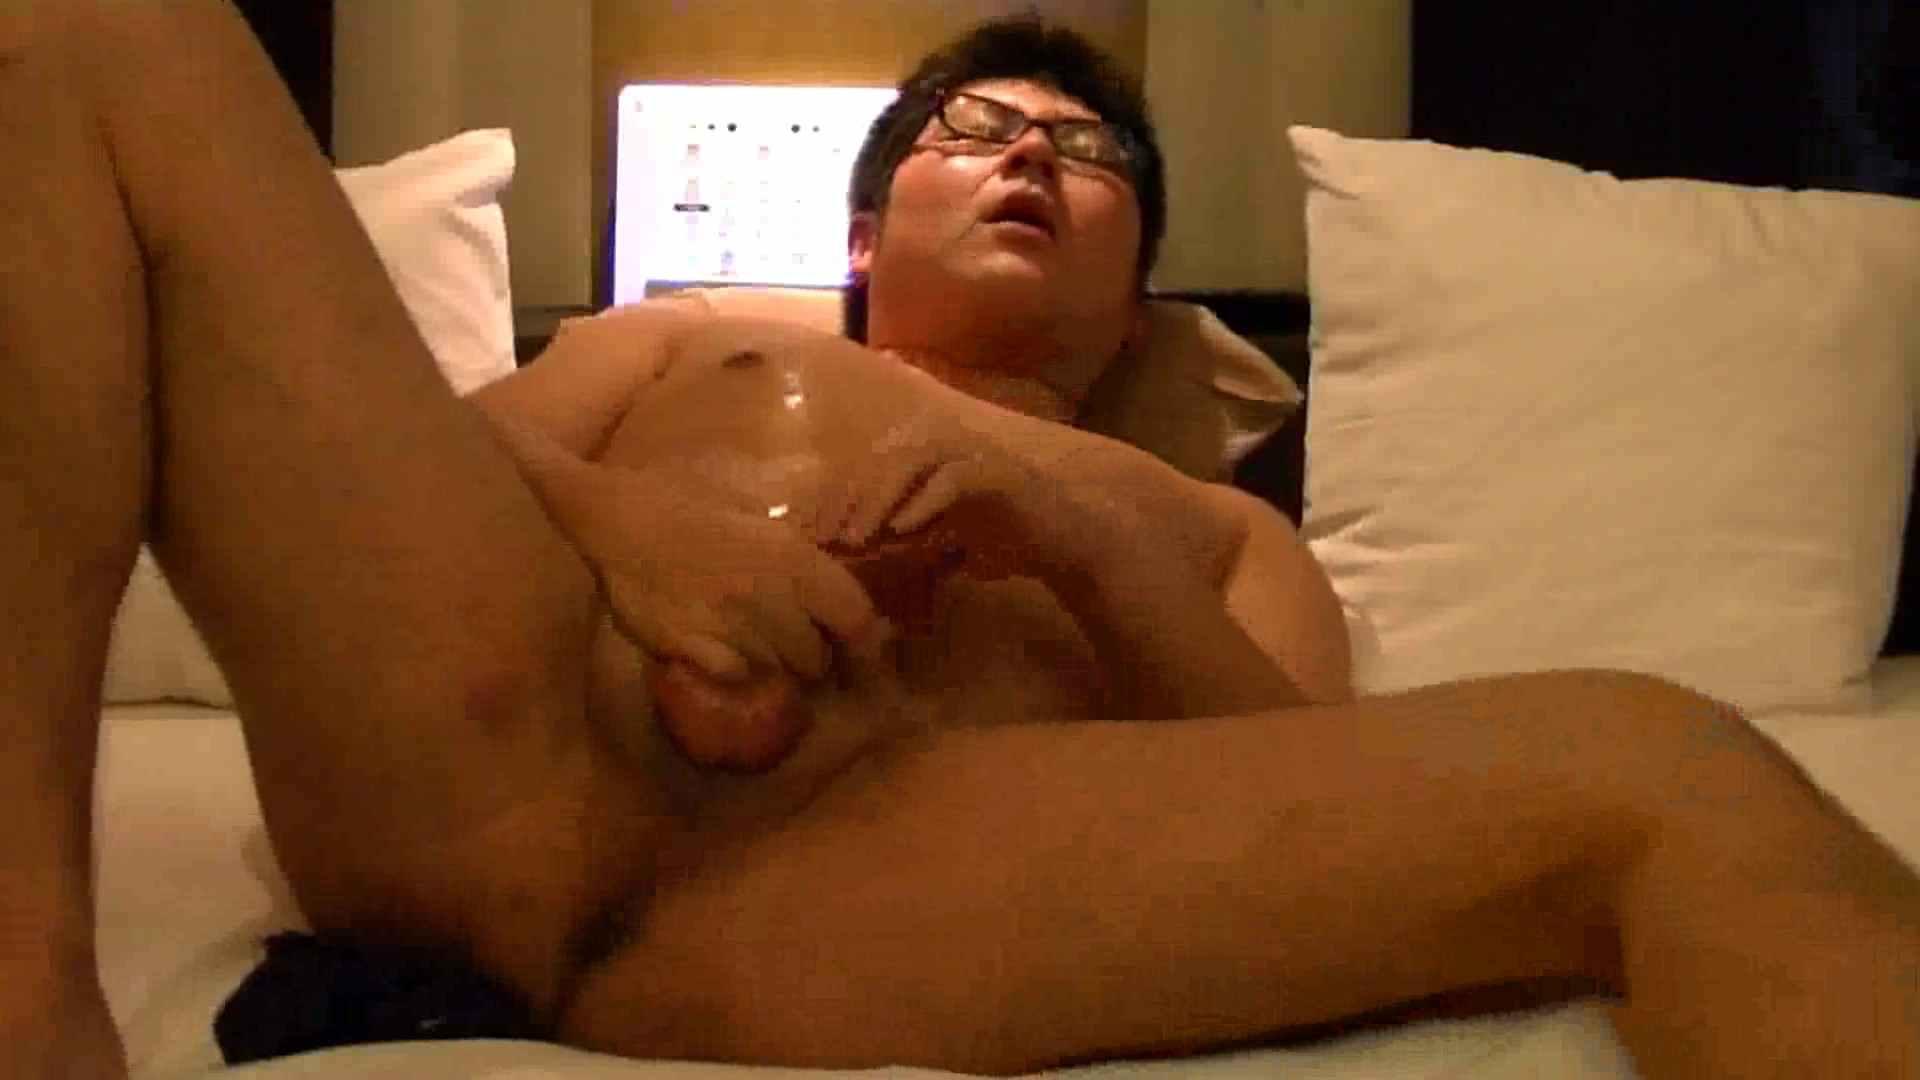 ONA見せカーニバル!! Vol5 エッチ ゲイ無修正ビデオ画像 45pic 30